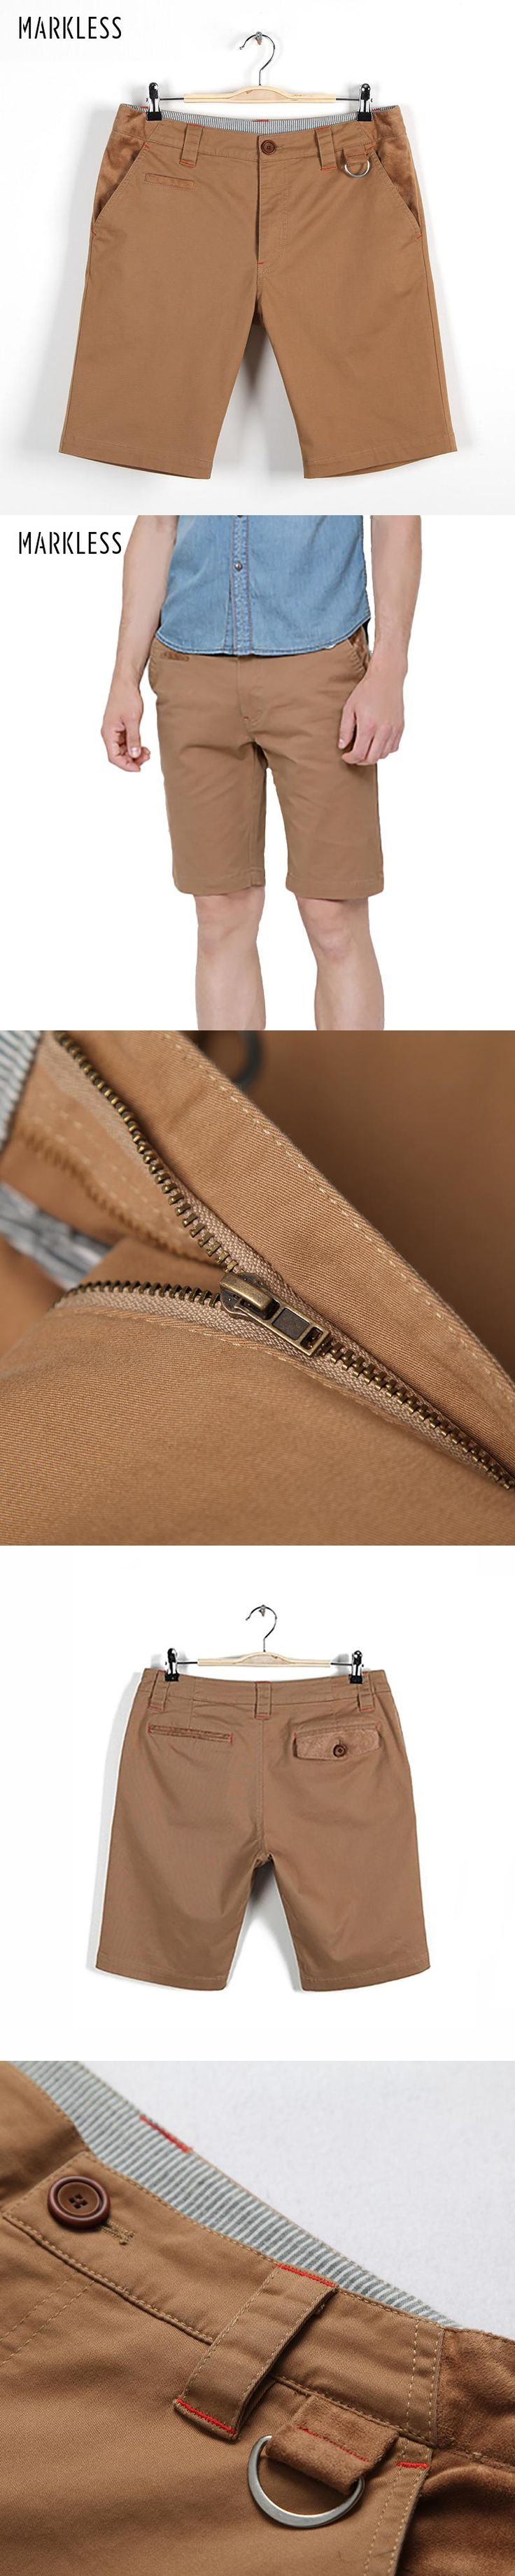 Markless Summer Casual Men Shorts Male Solid Khaki Capris Beach Straight Short Pants Fashion Man Shorts Hot Free Shipping